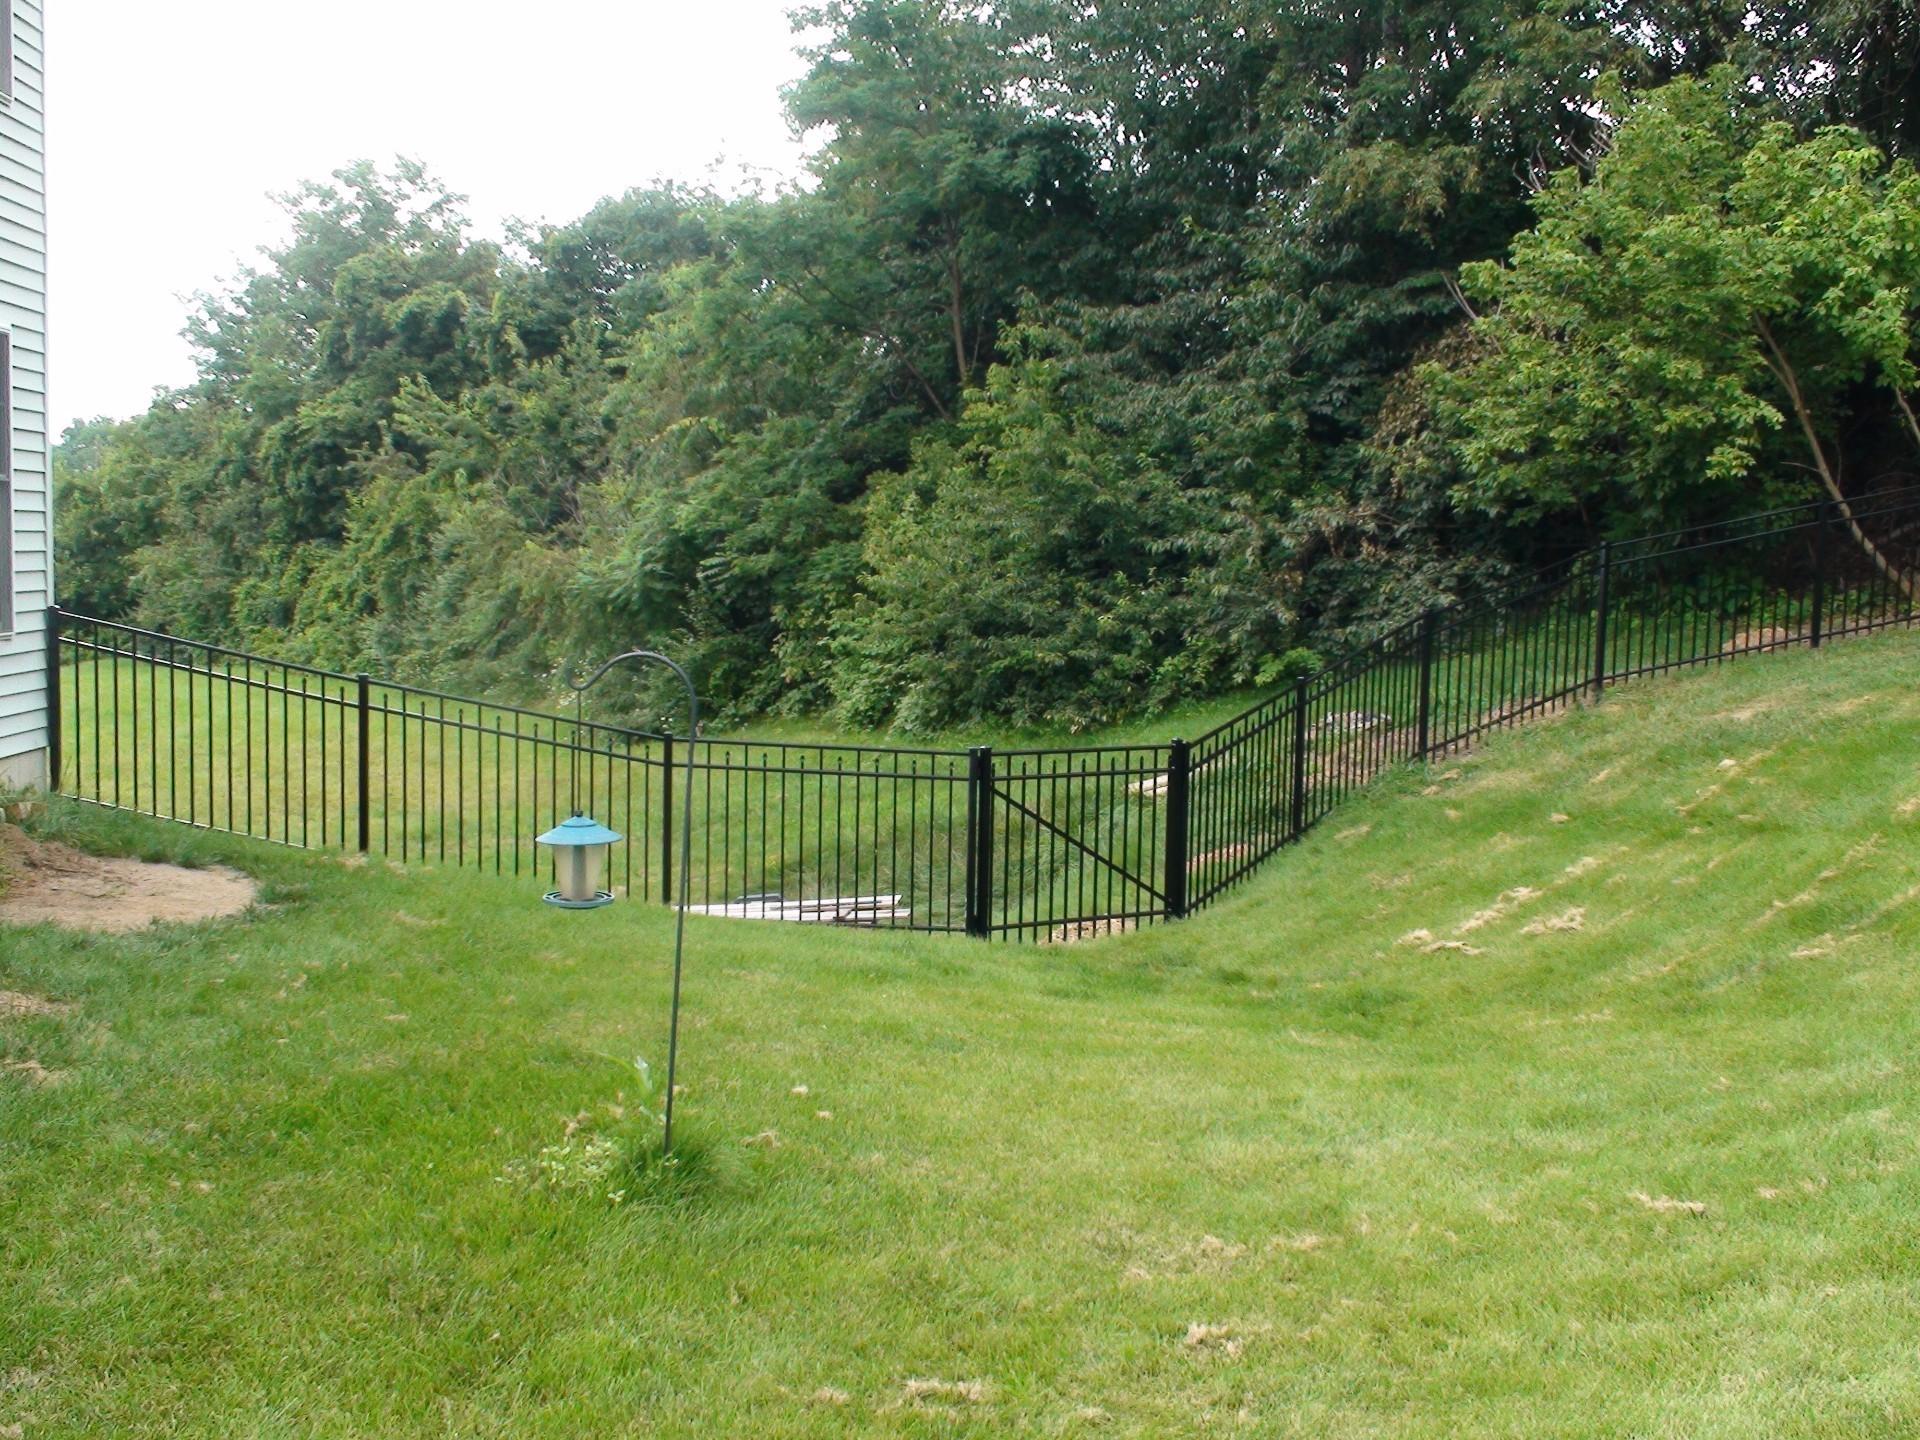 Aluminum Fence Pics In Lebanon County